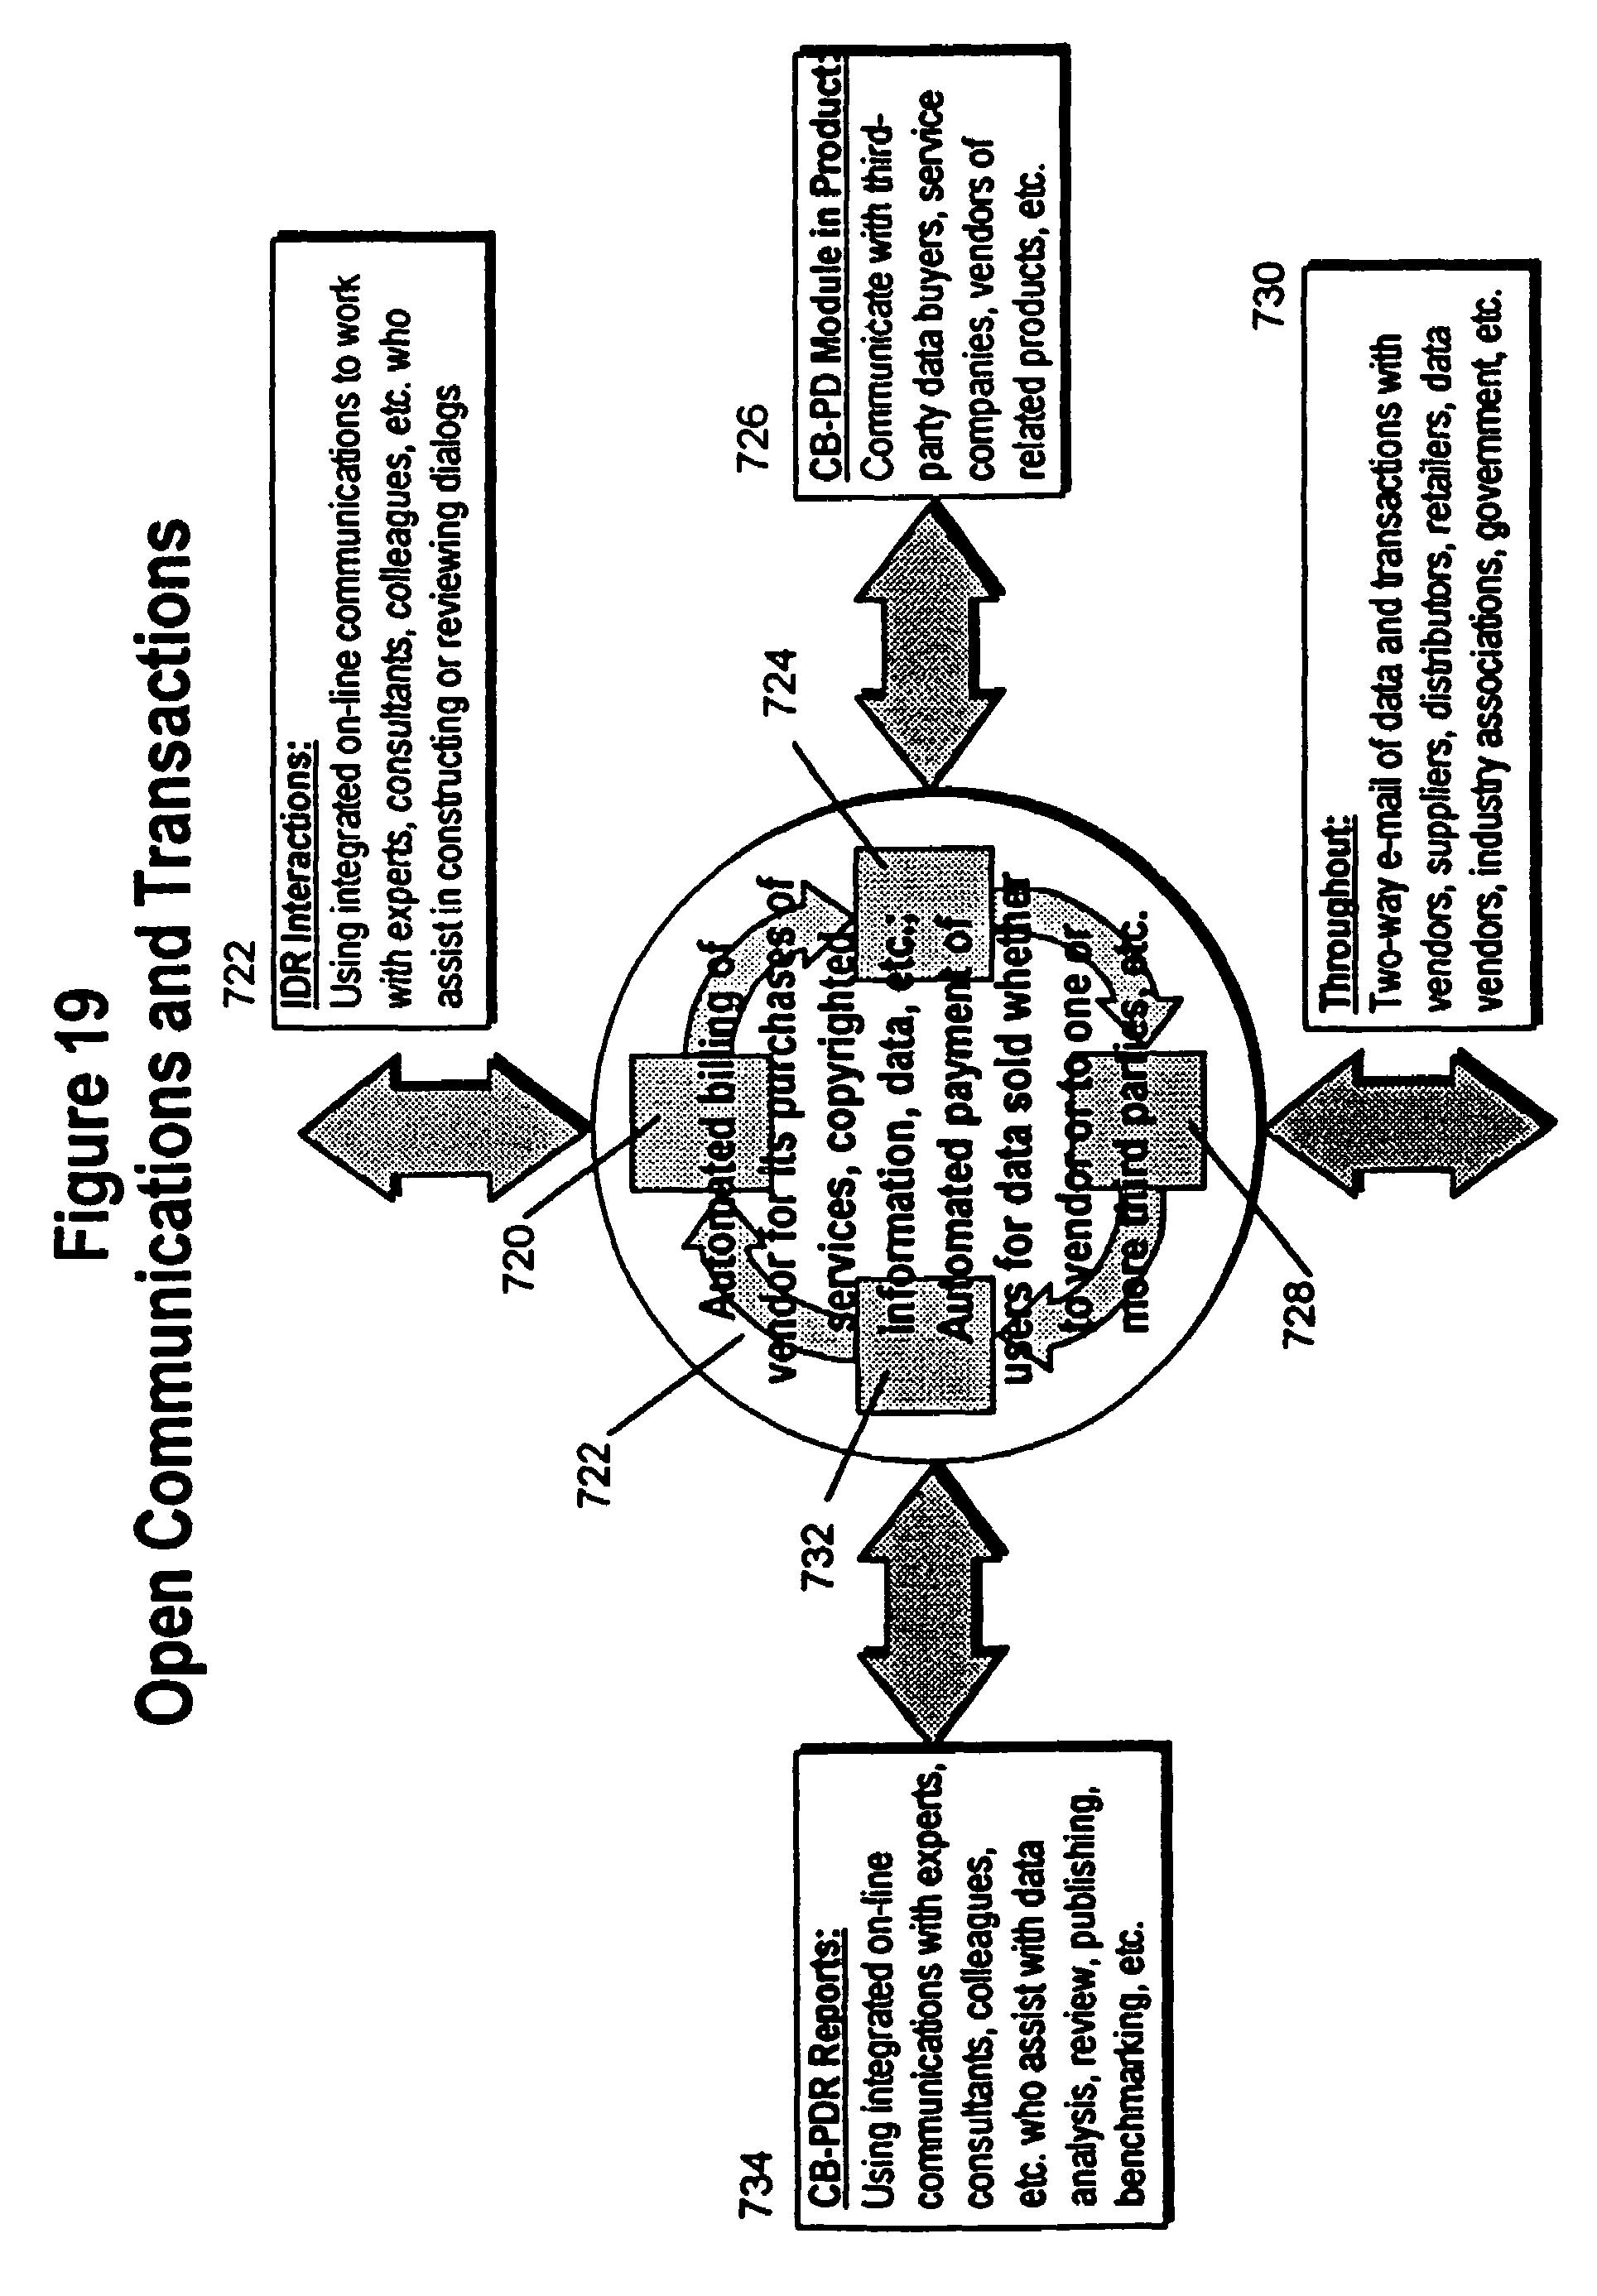 Patent US 7,620,565 B2